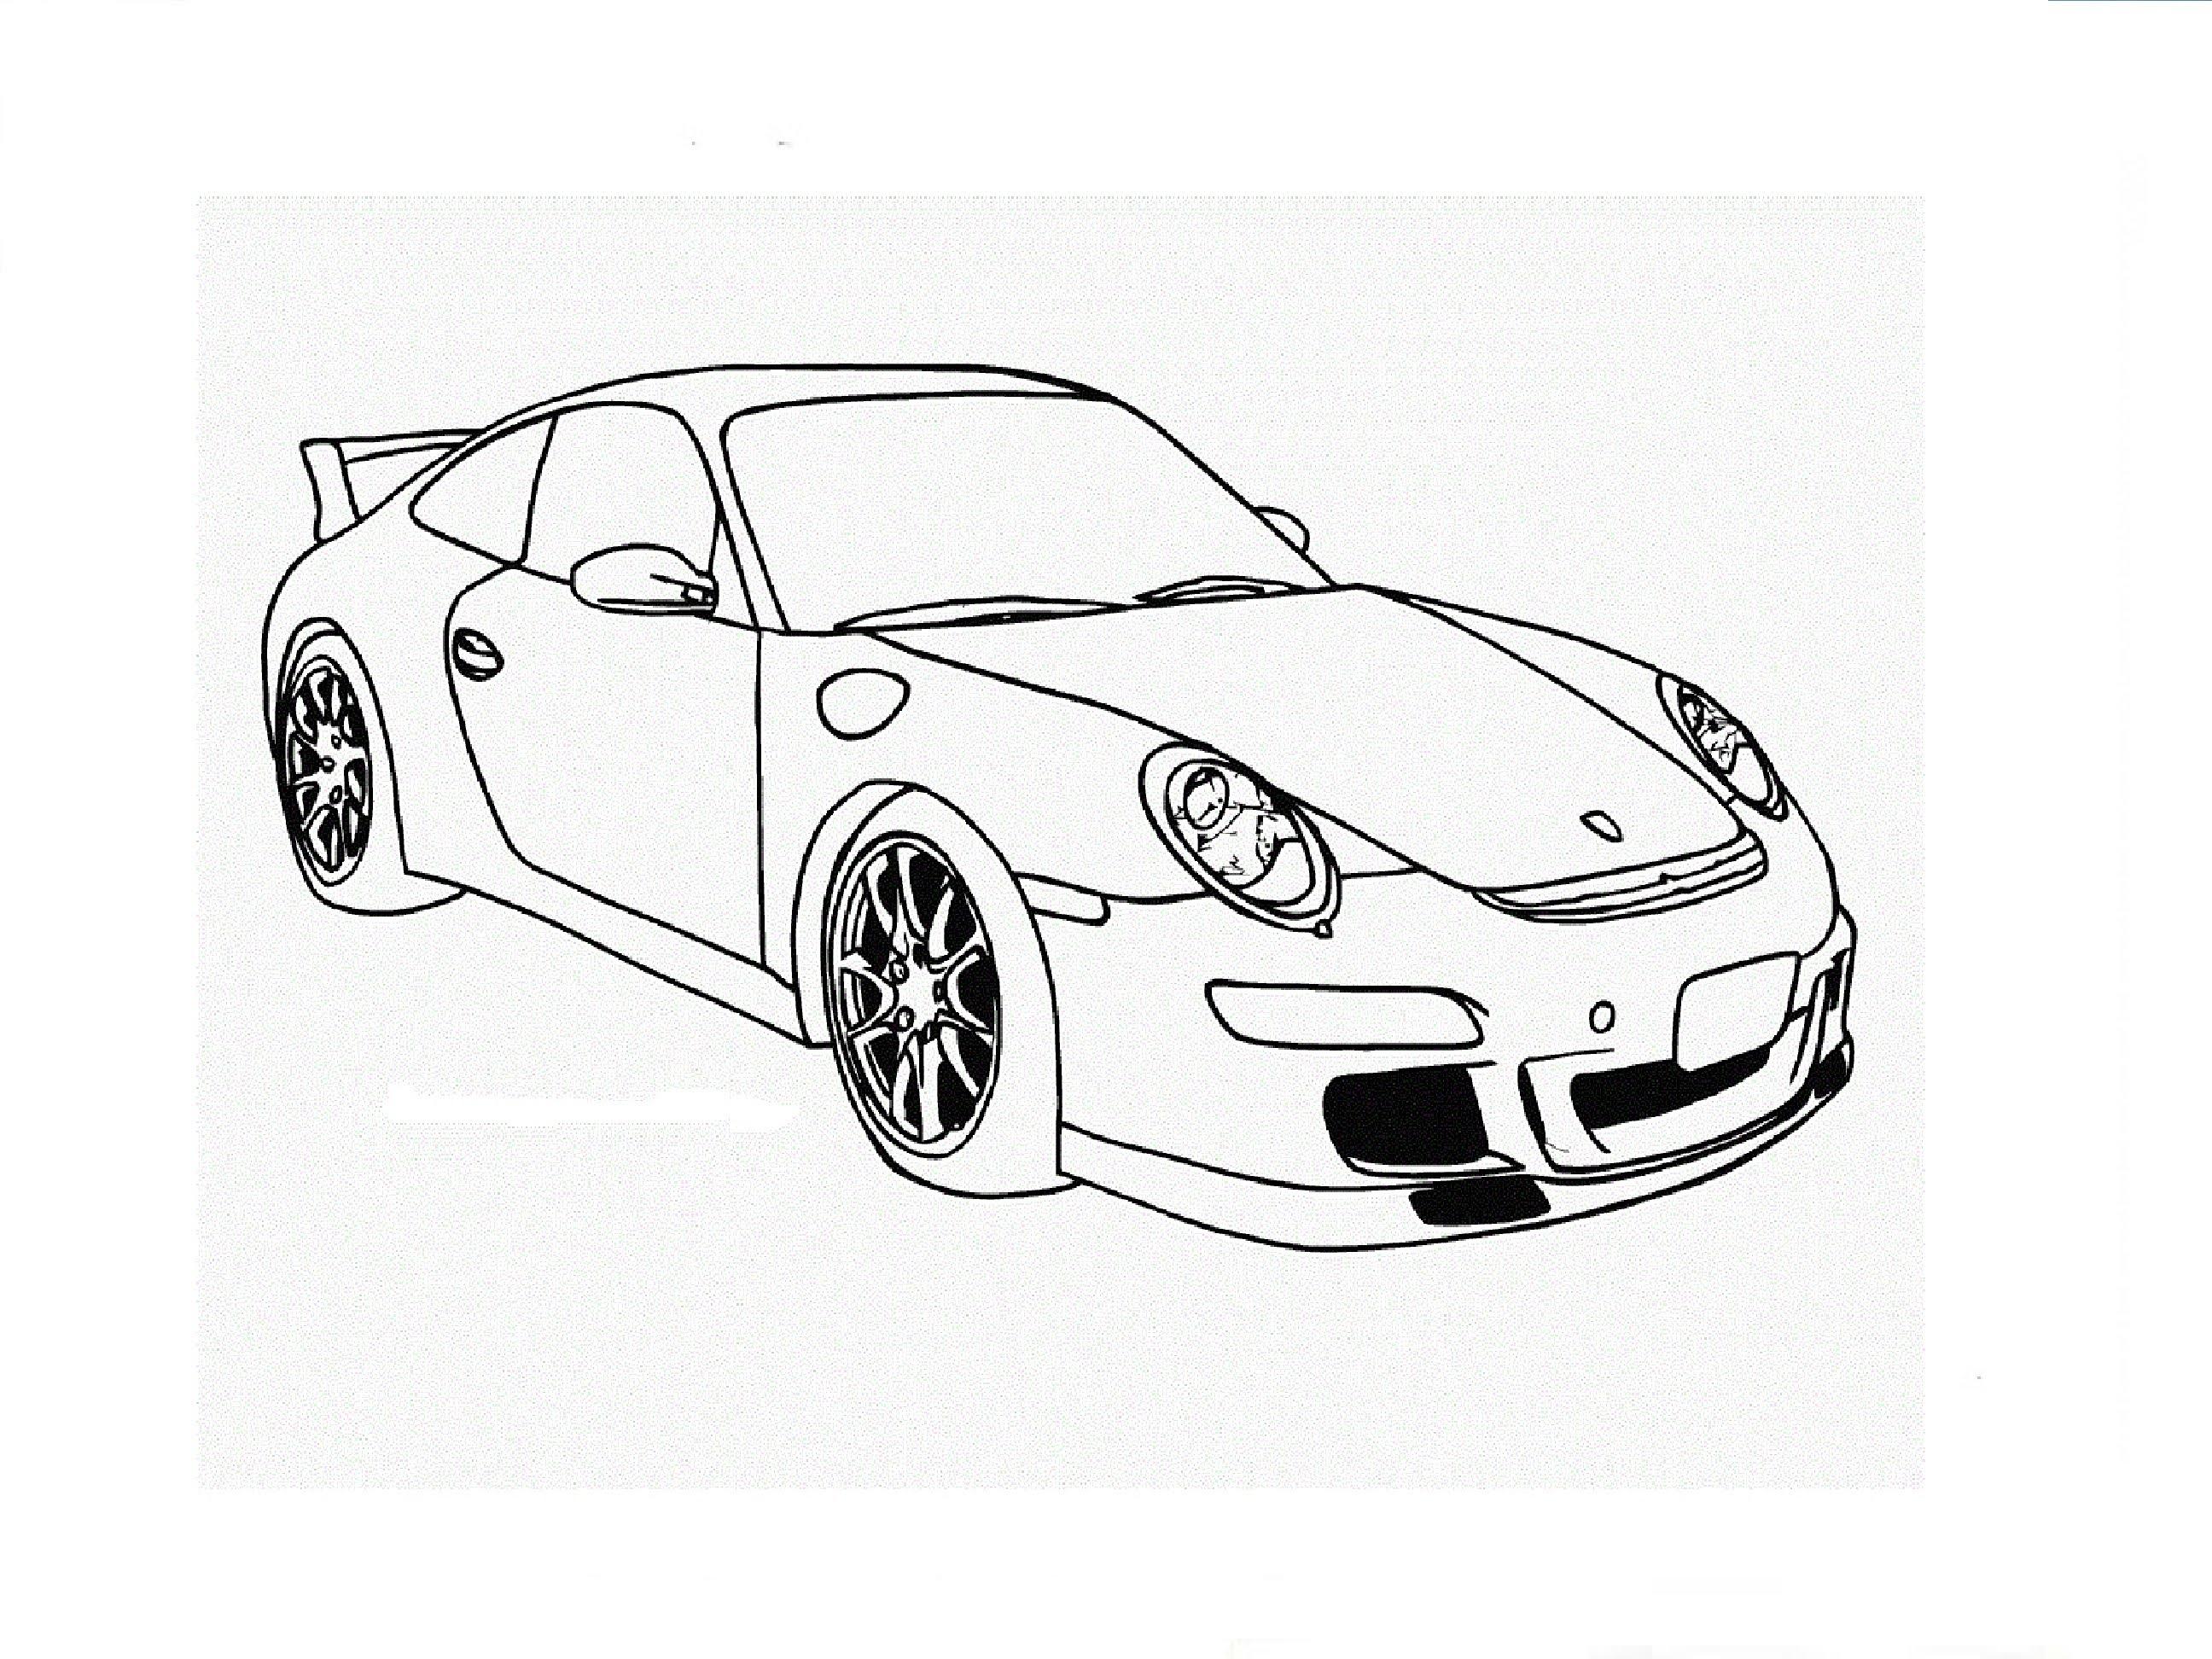 Porsche 911 Drawing At GetDrawings.com